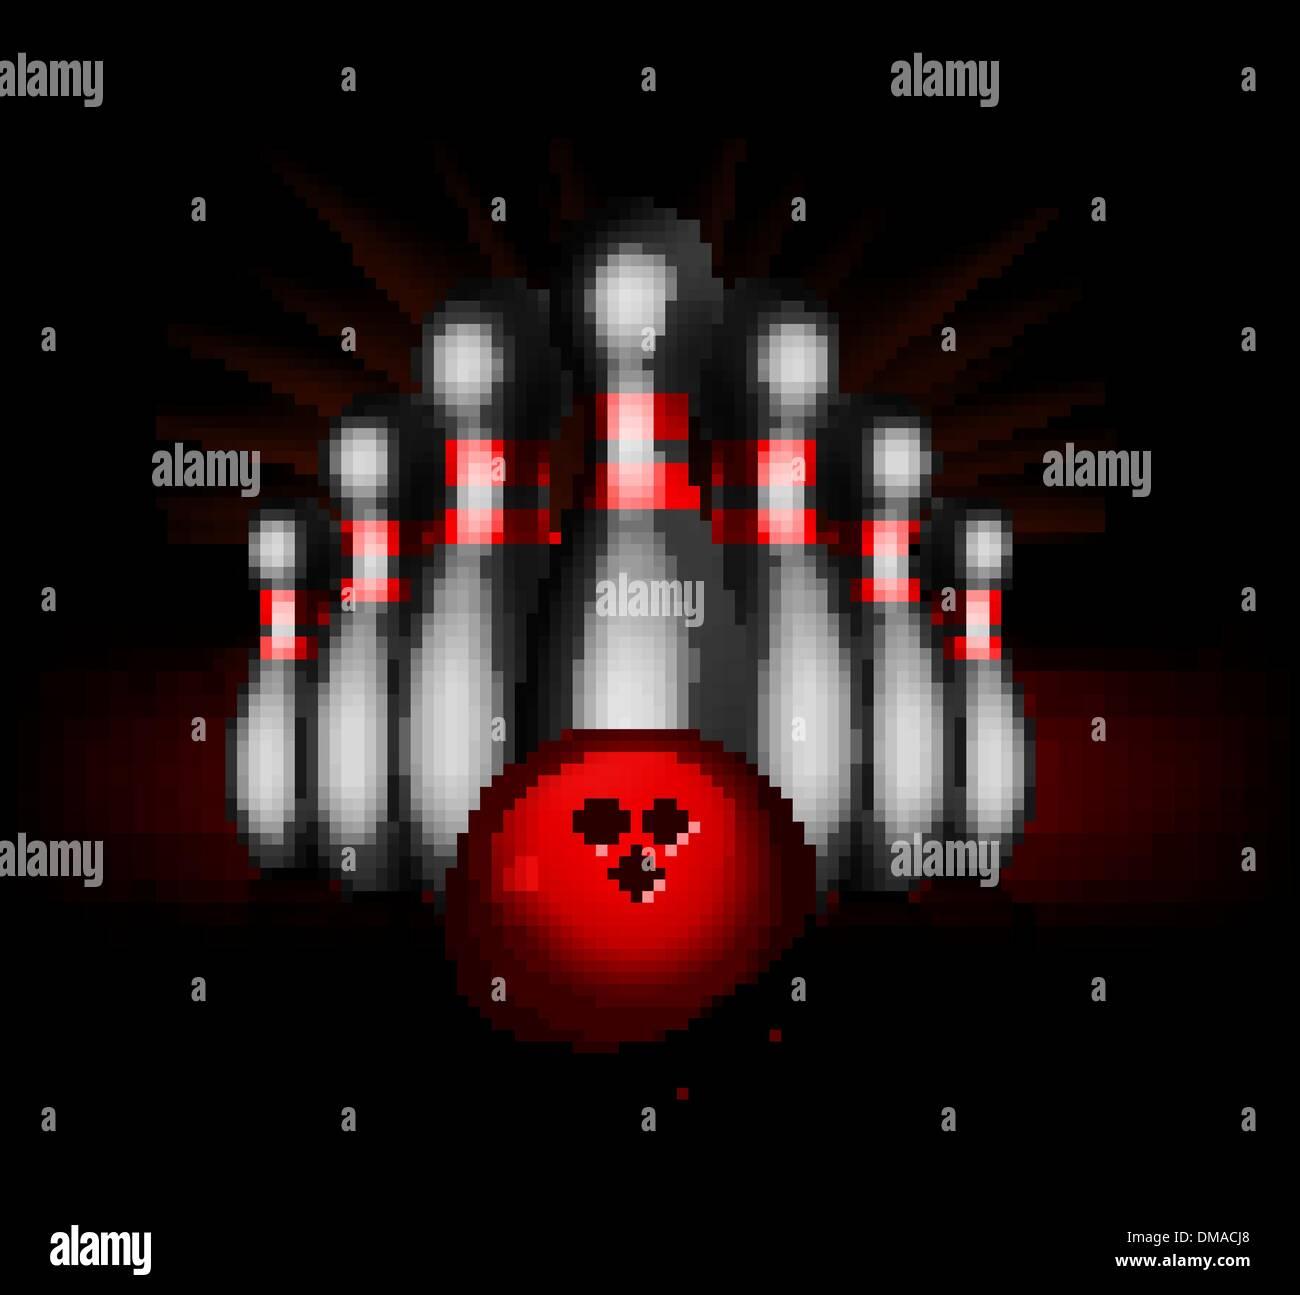 Bowling vector illustration - Stock Vector